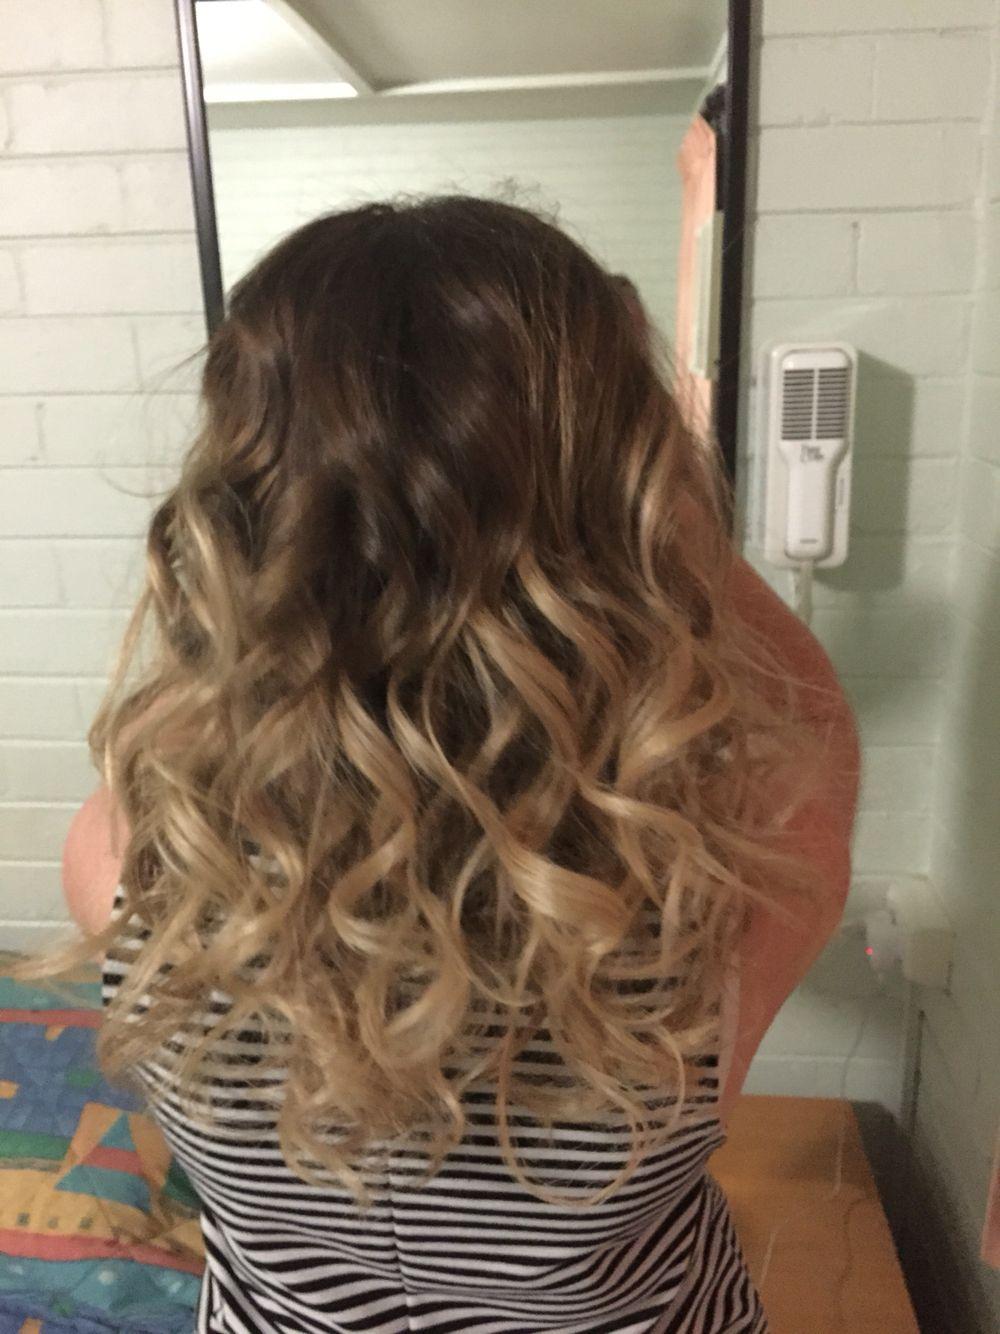 Ballayage Blond pour curly blonde ballayage | hairi <3 | pinterest | curly blonde